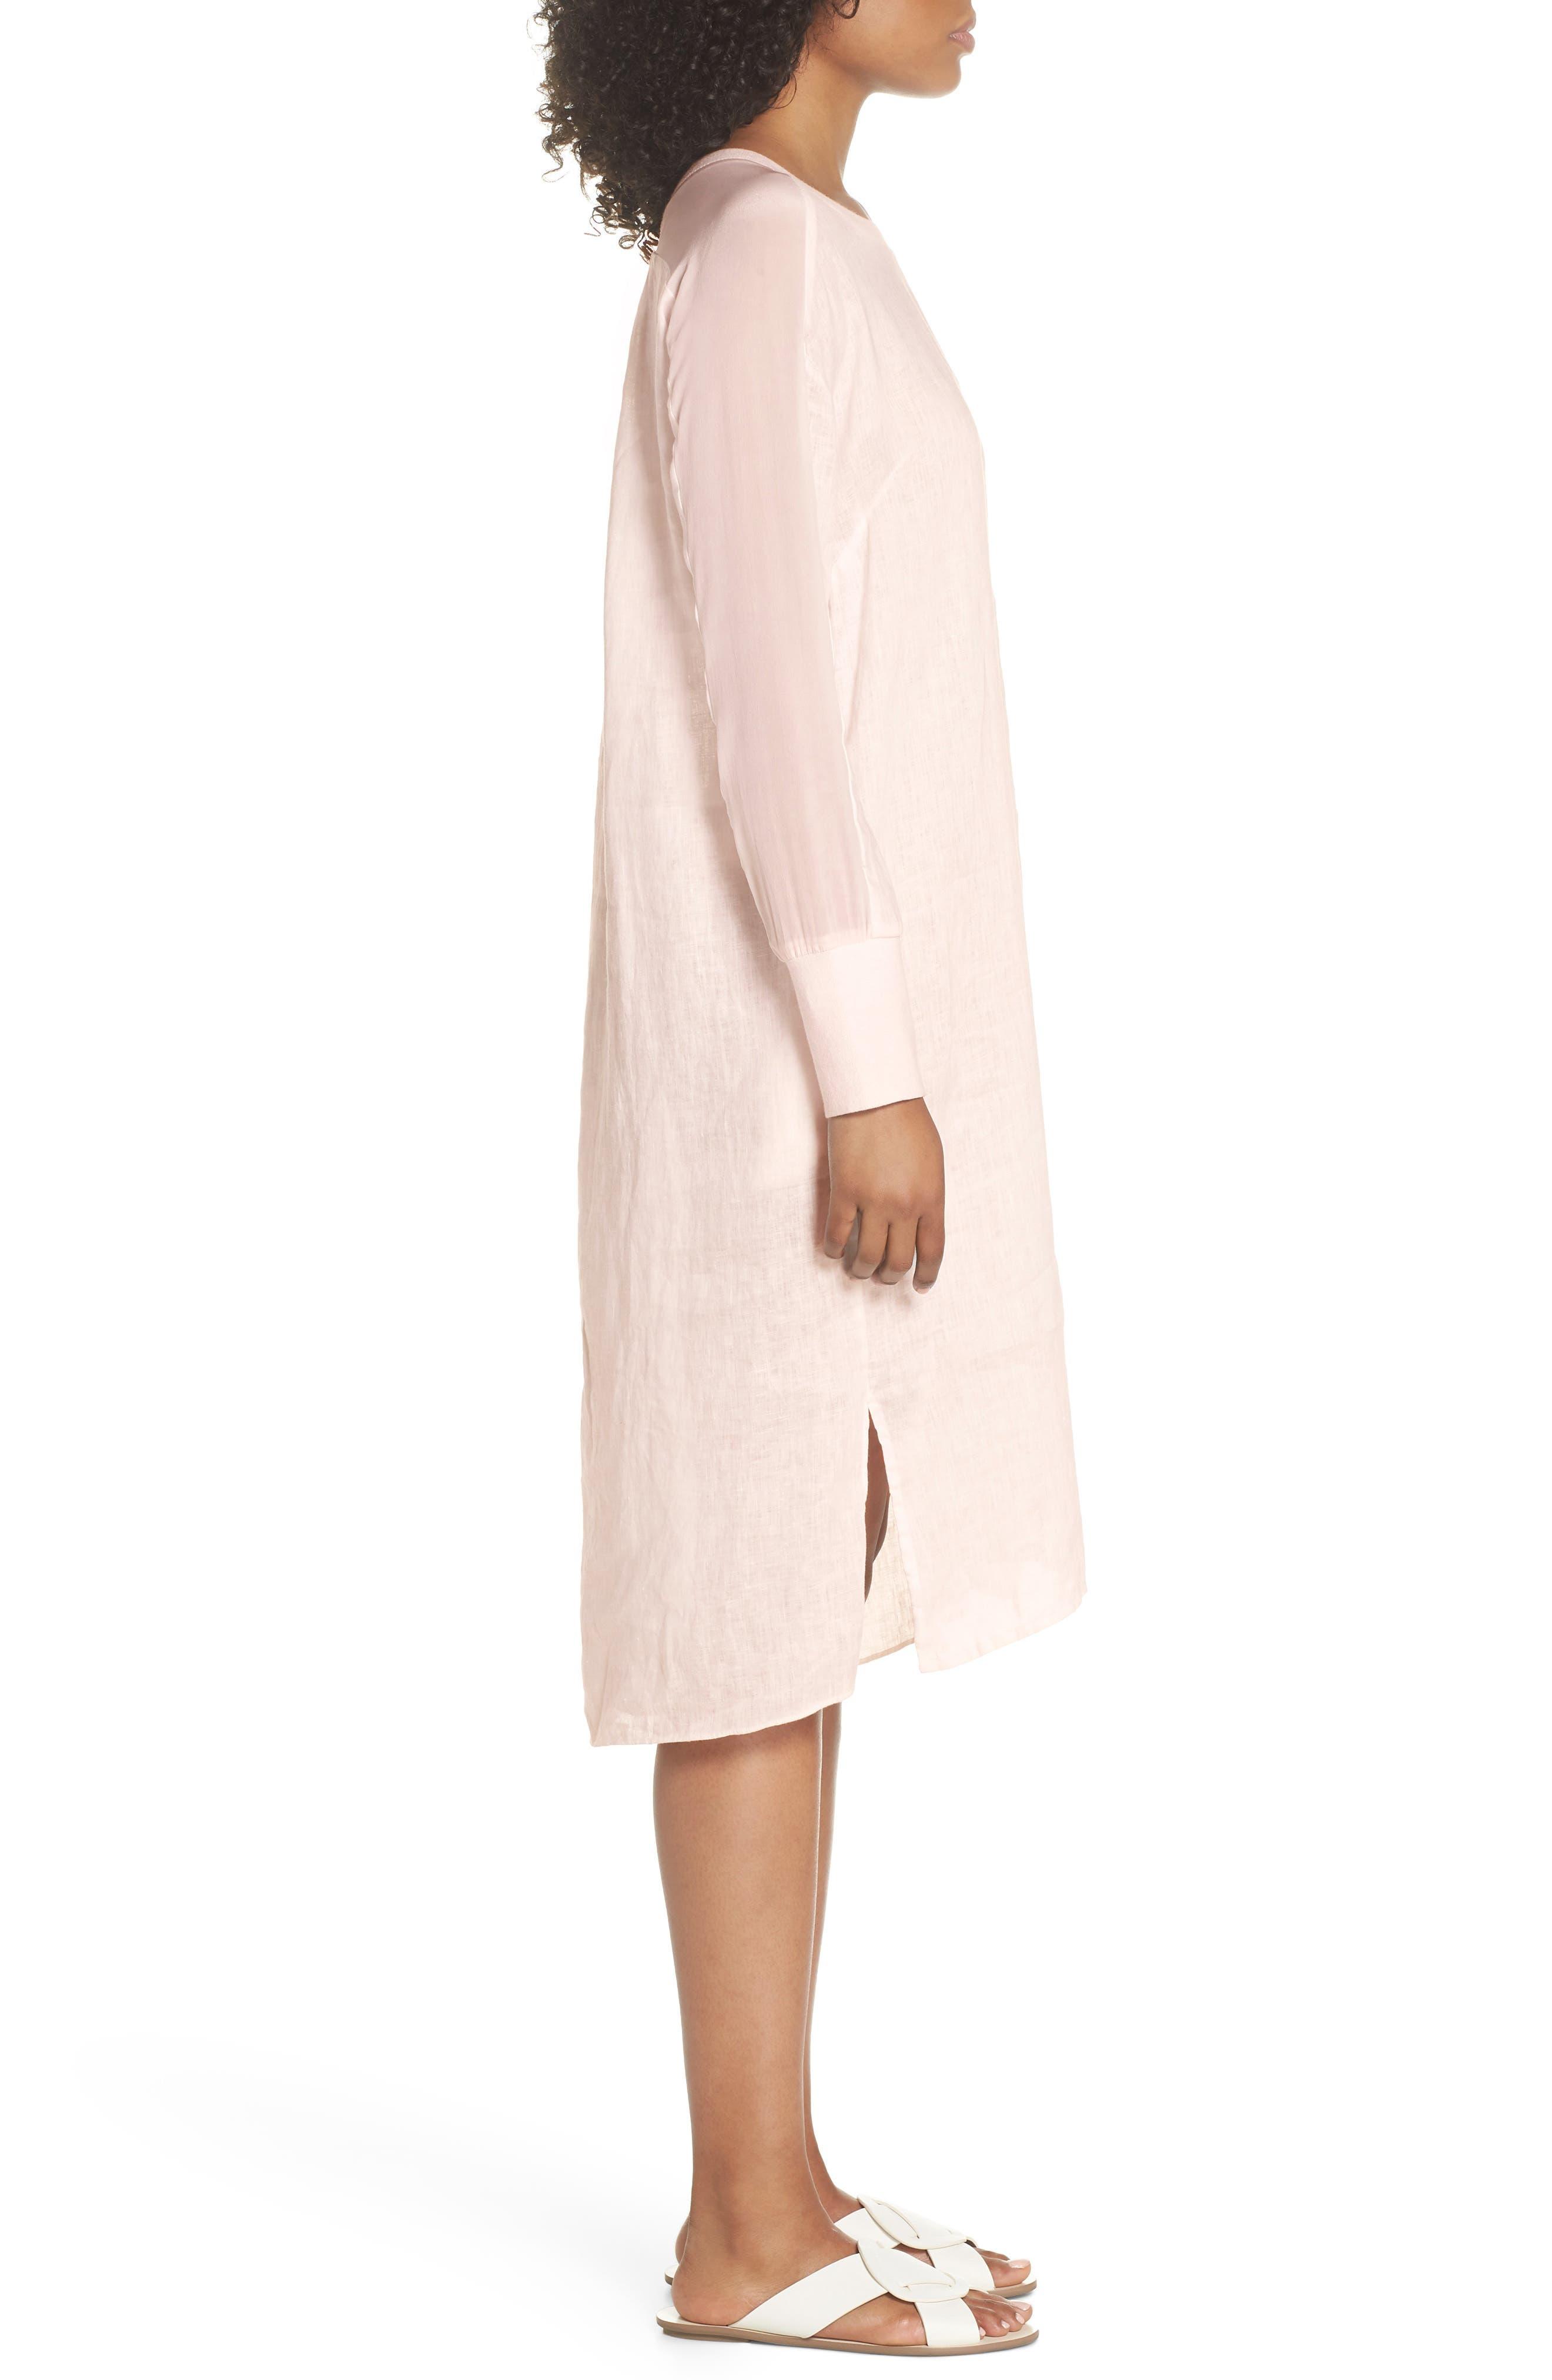 Rata Linen Shift Dress,                             Alternate thumbnail 3, color,                             680